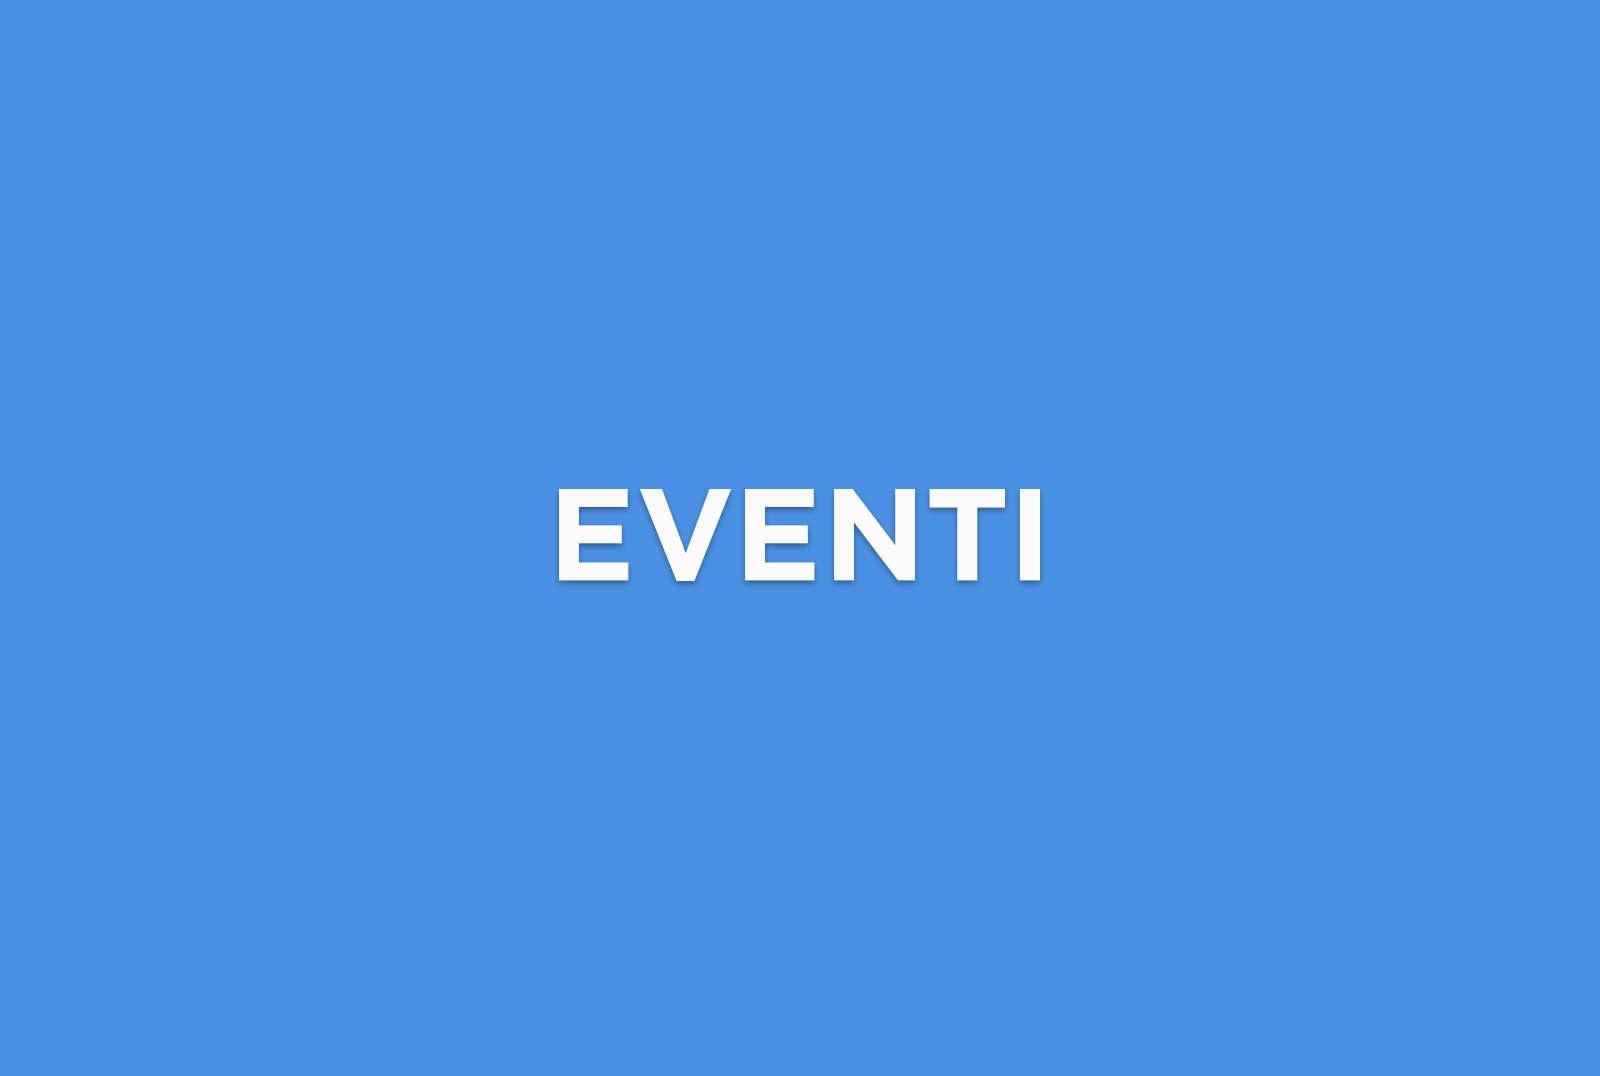 eventi_thumb